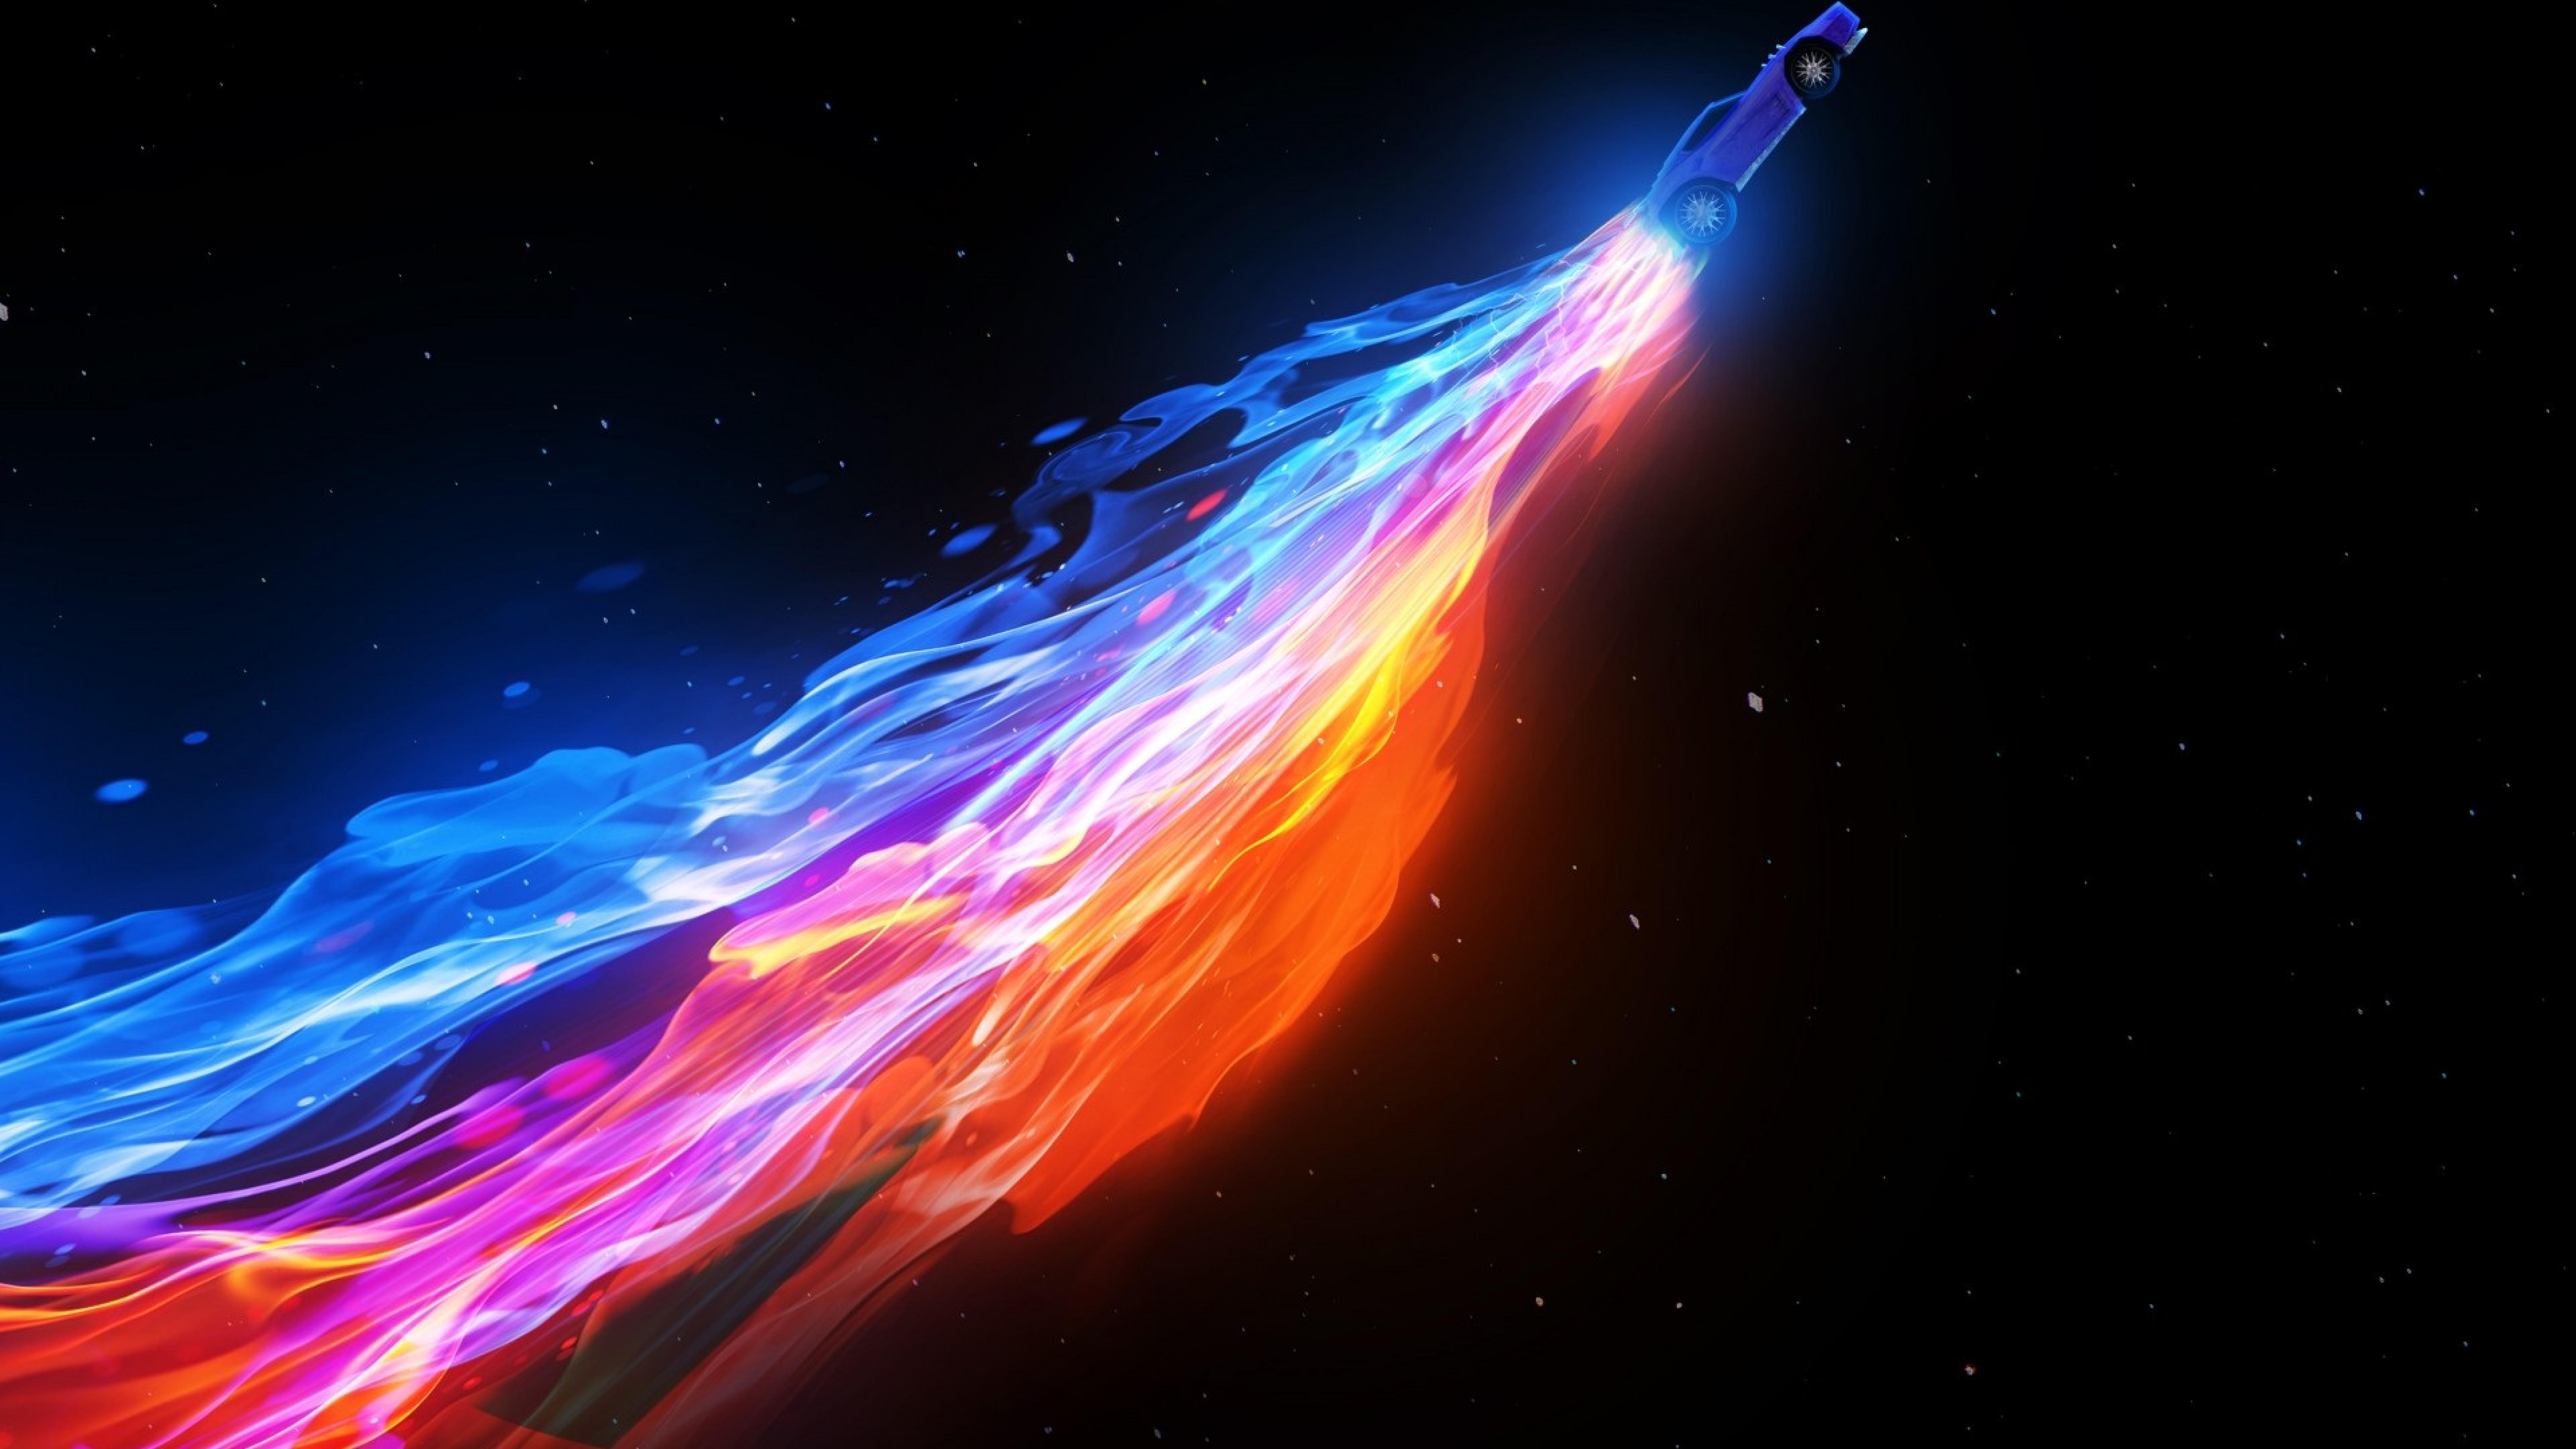 Download Galaxy Note 5 Galaxy S6 Edge Full Hd Stock: Flame Rainbow Car, Full HD Wallpaper